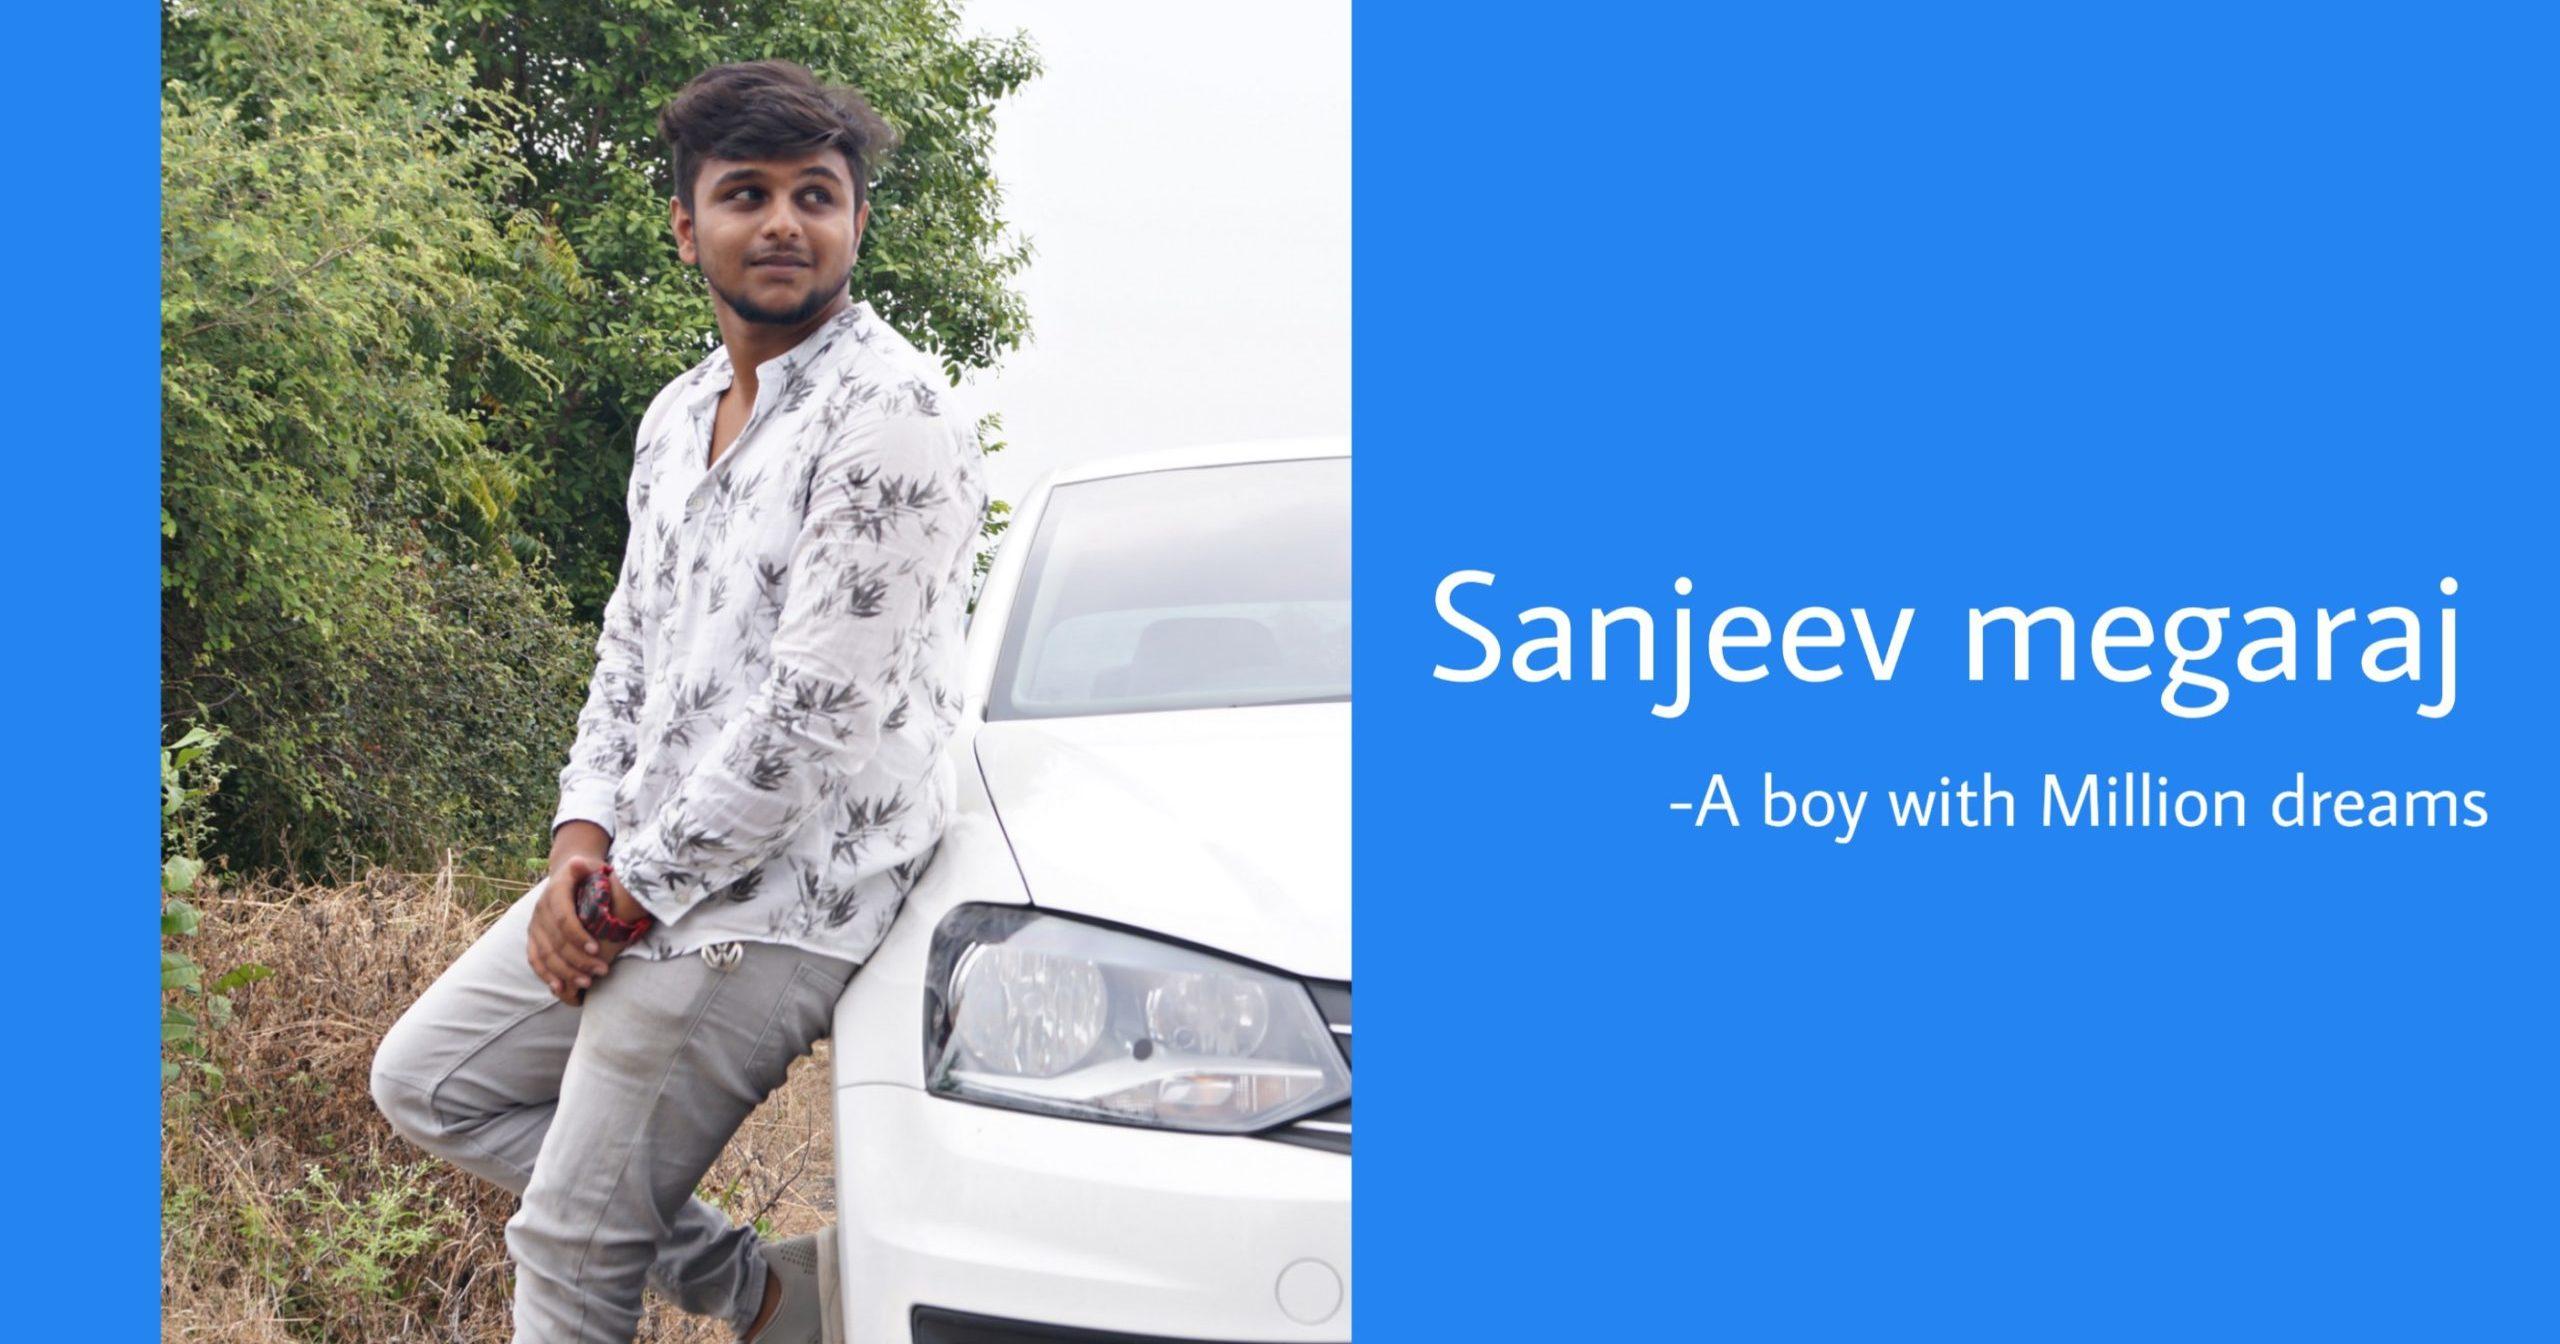 Interview with an Instagram Influencer: Sanjeev Megaraj